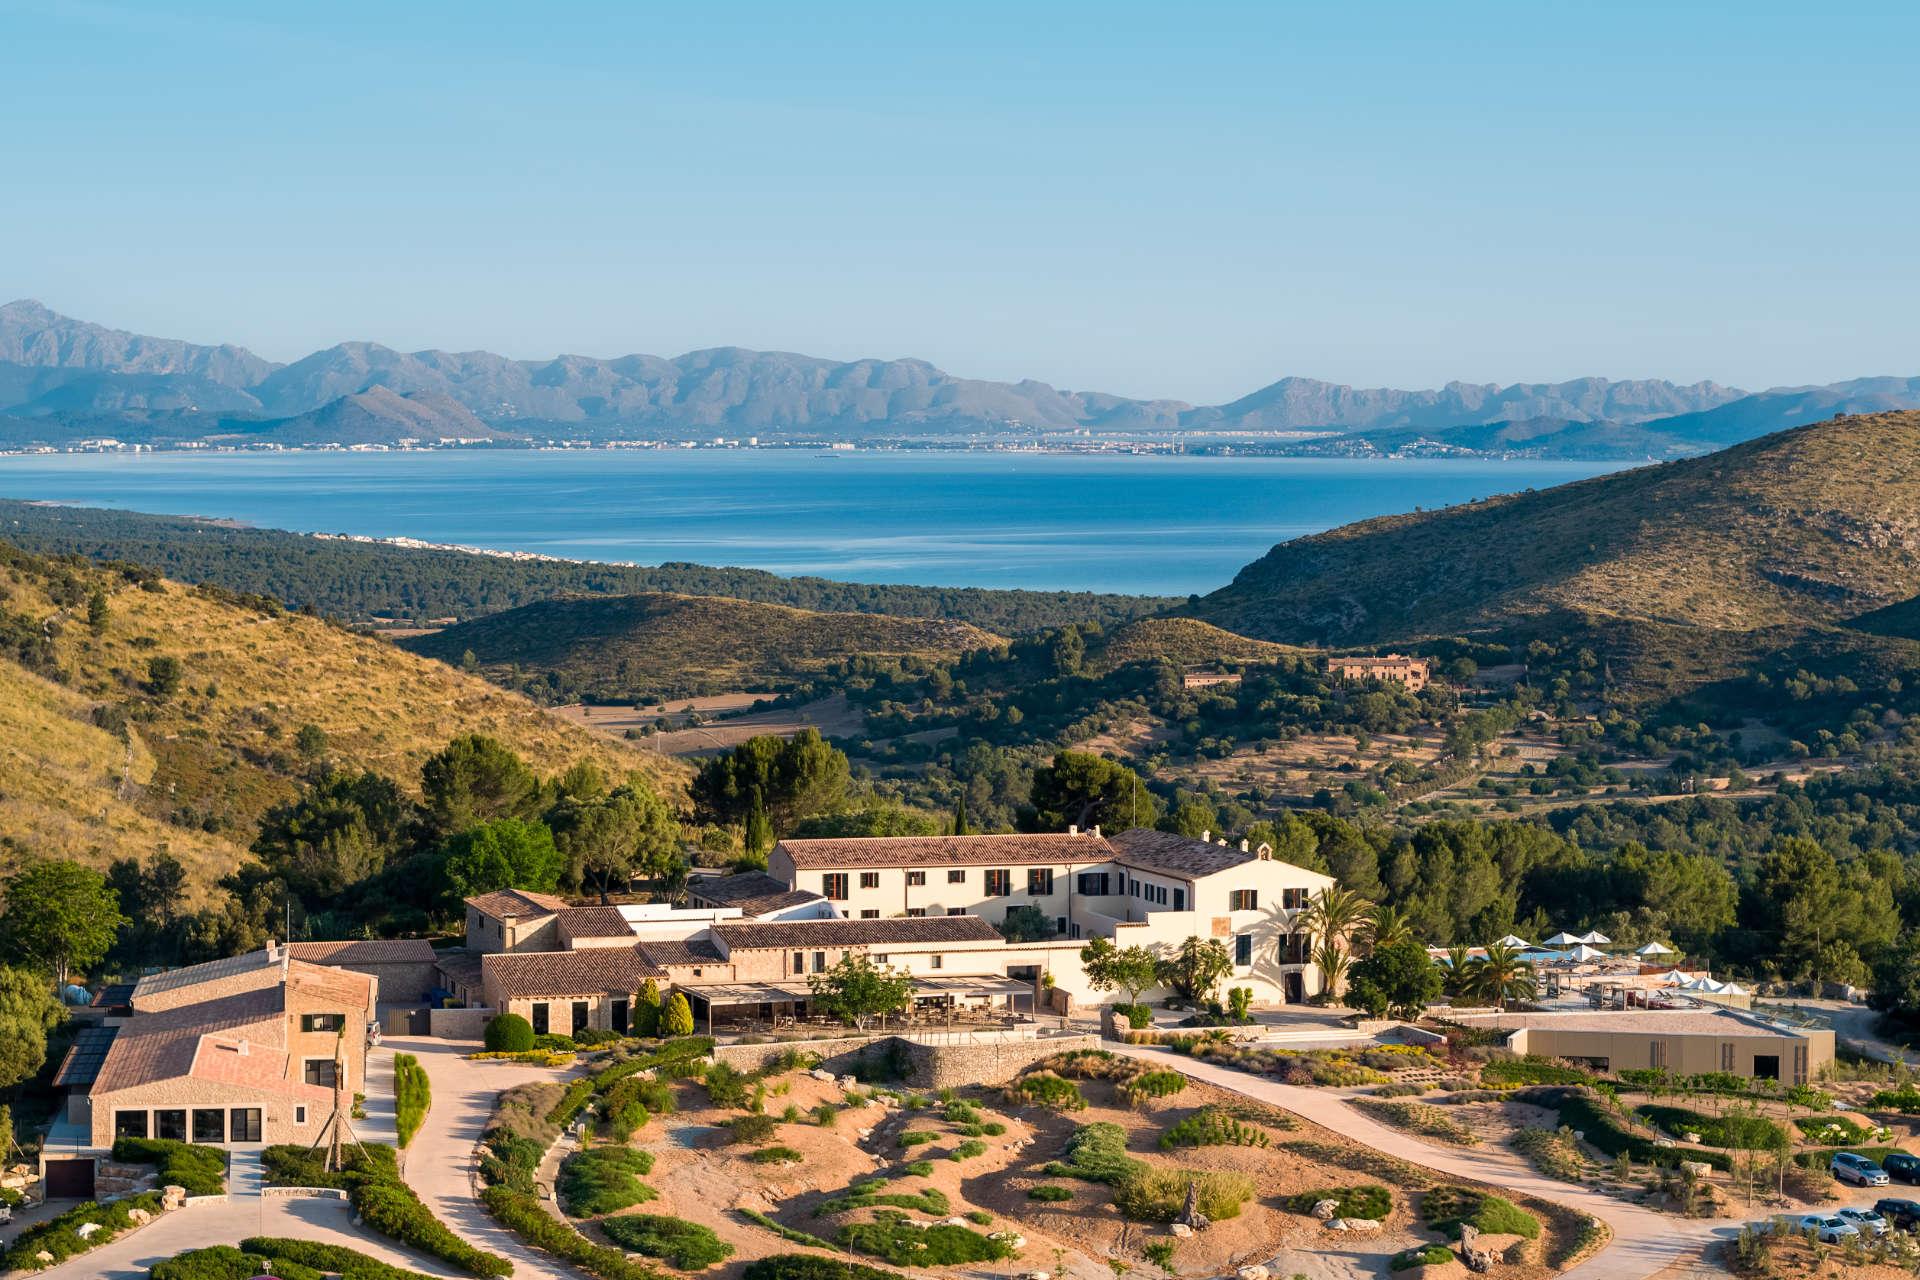 Carrossa Hotel Spa Villas Mallorca Anlage